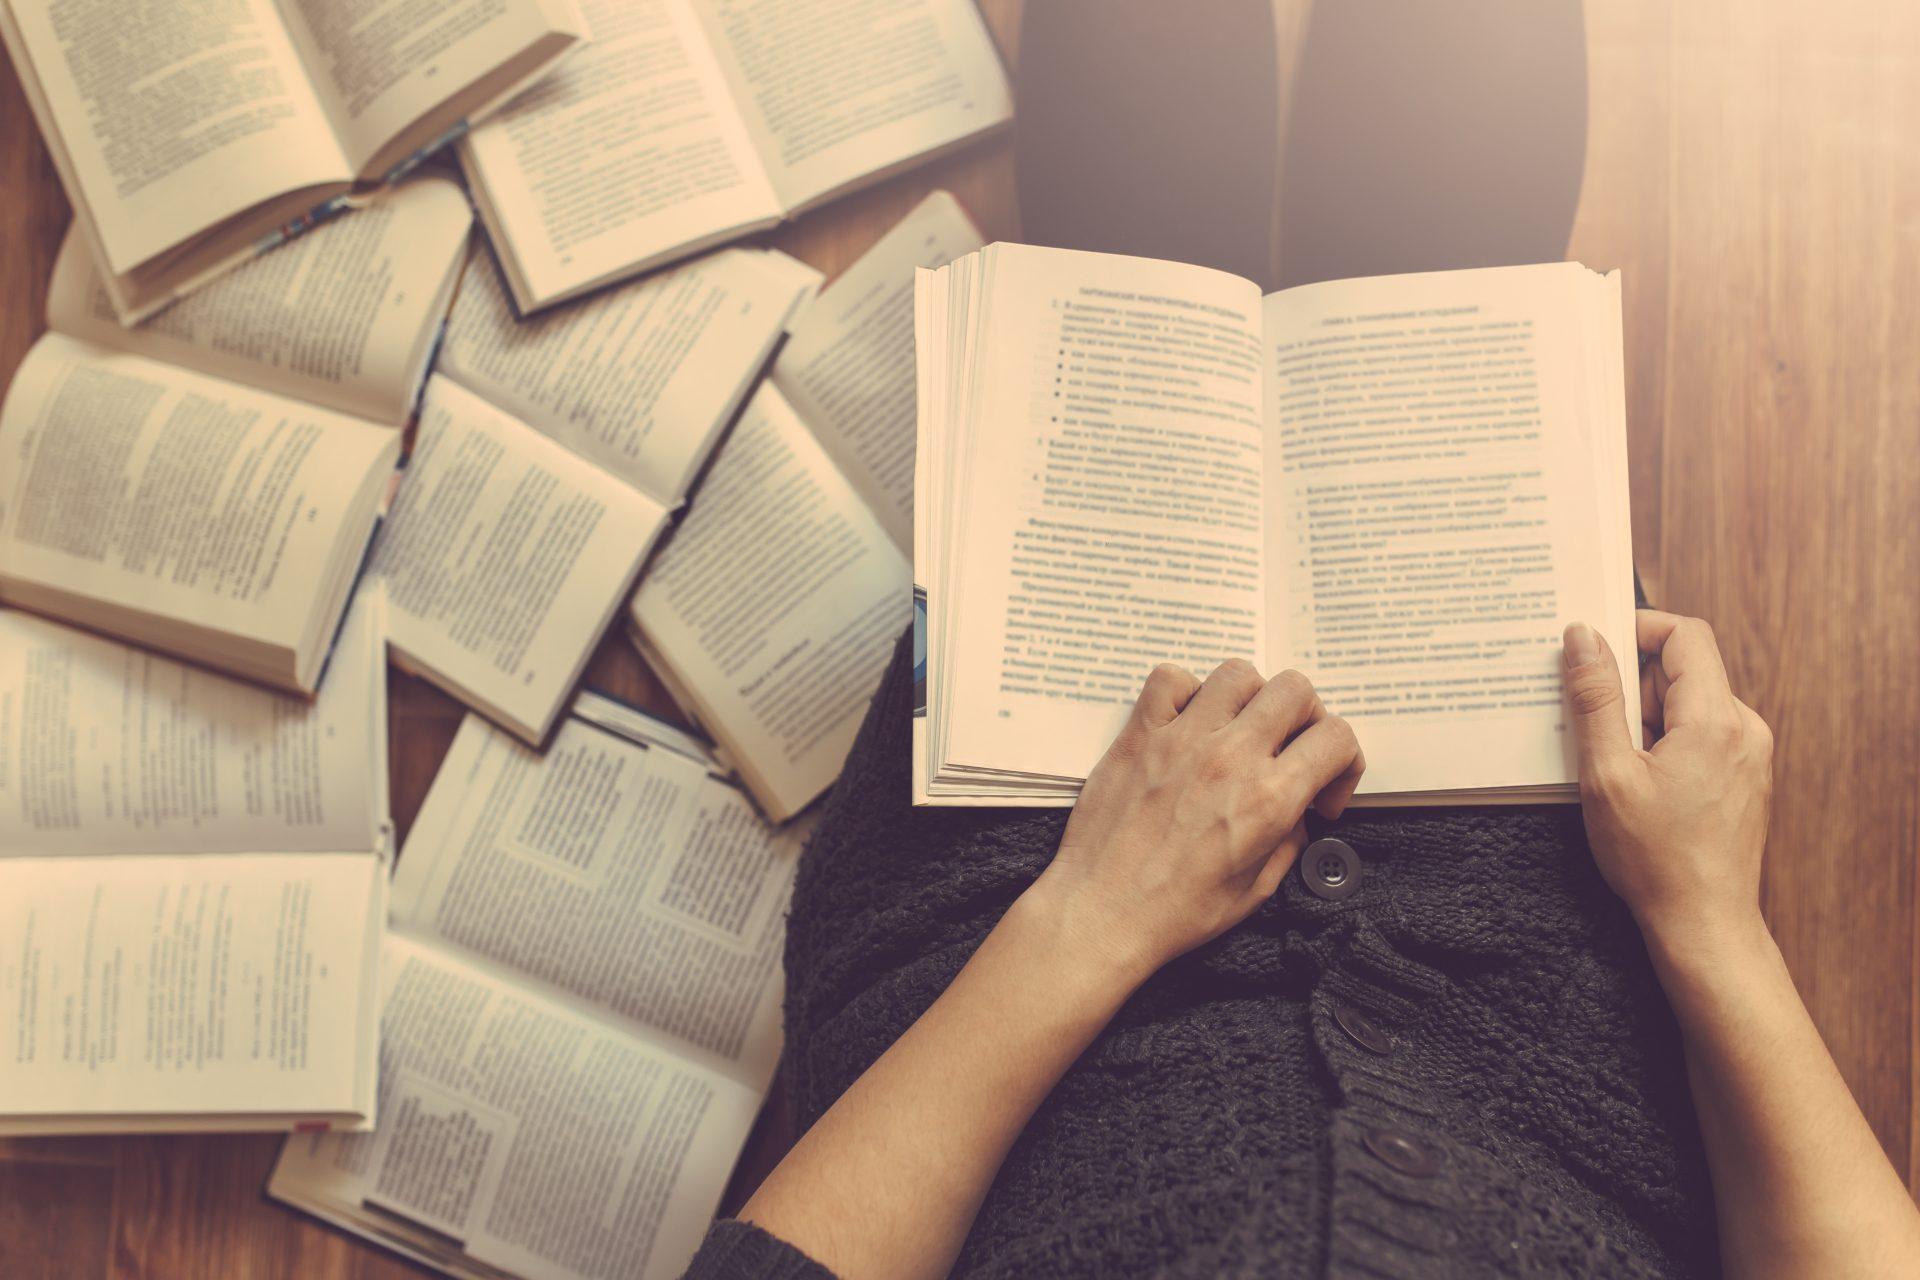 Let's Get Building A Personal Books' Cache